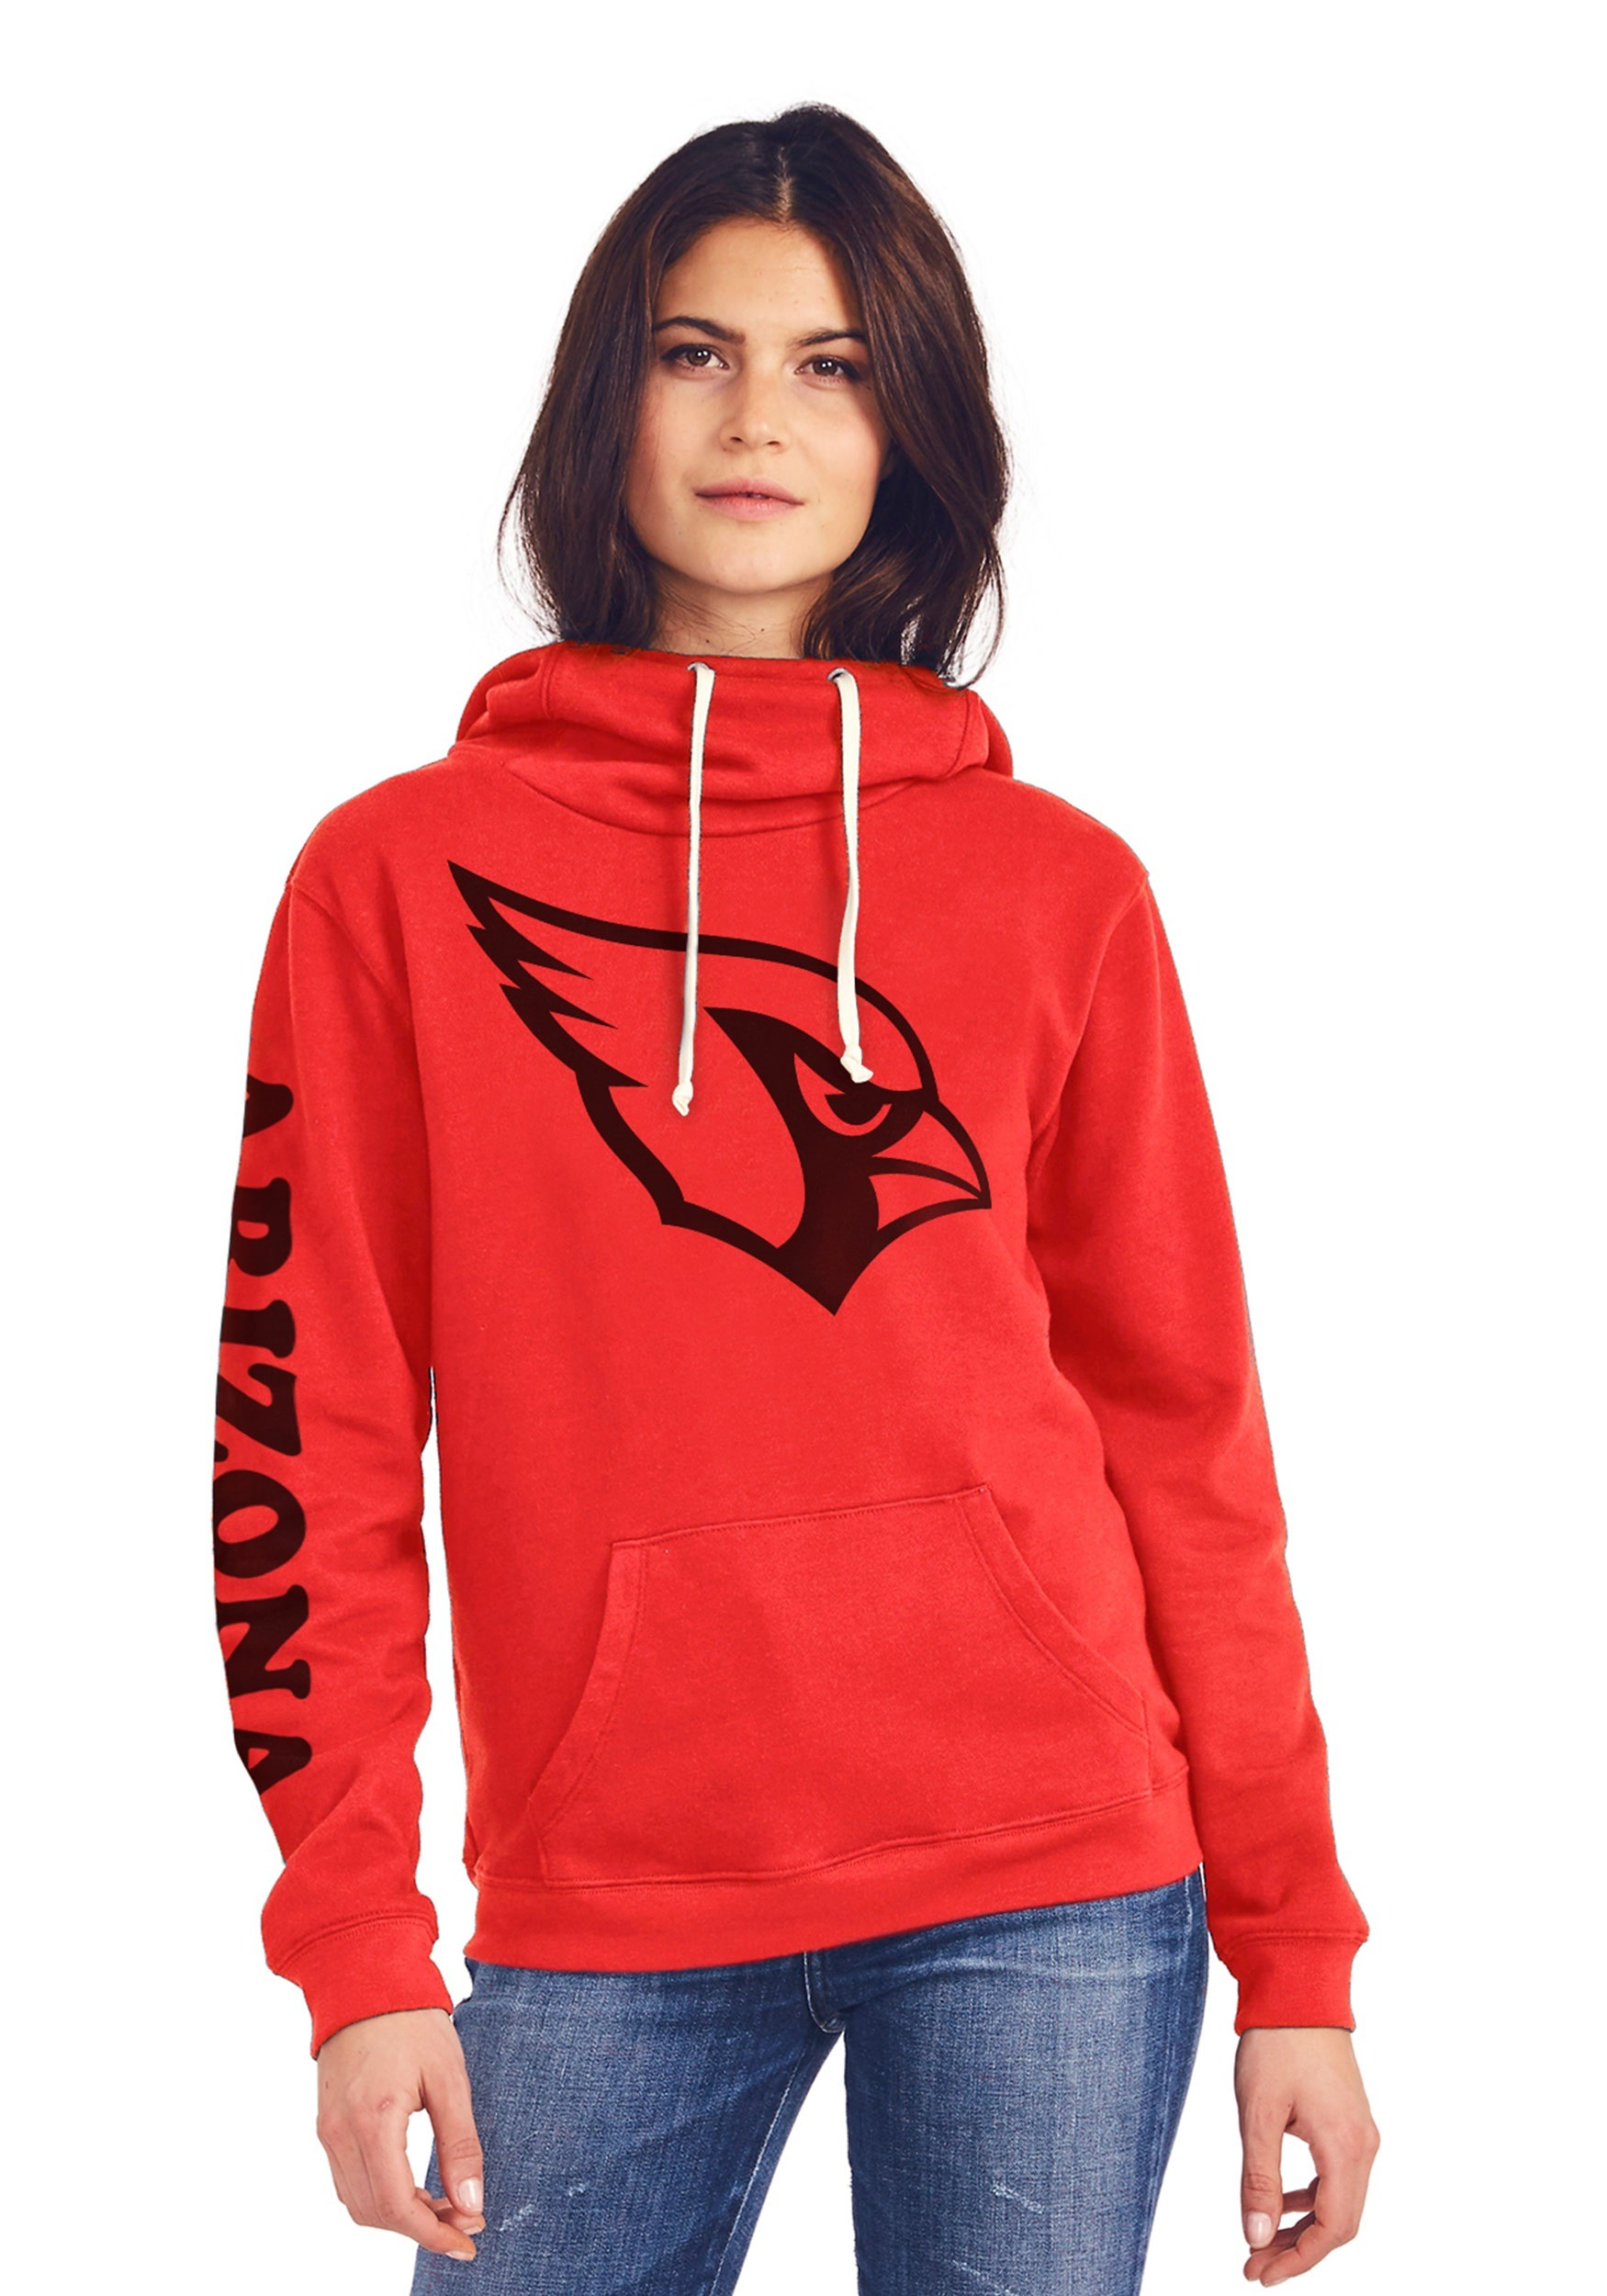 Arizona Cardinals Women's Cowl Neck Hooded Sweatshirt